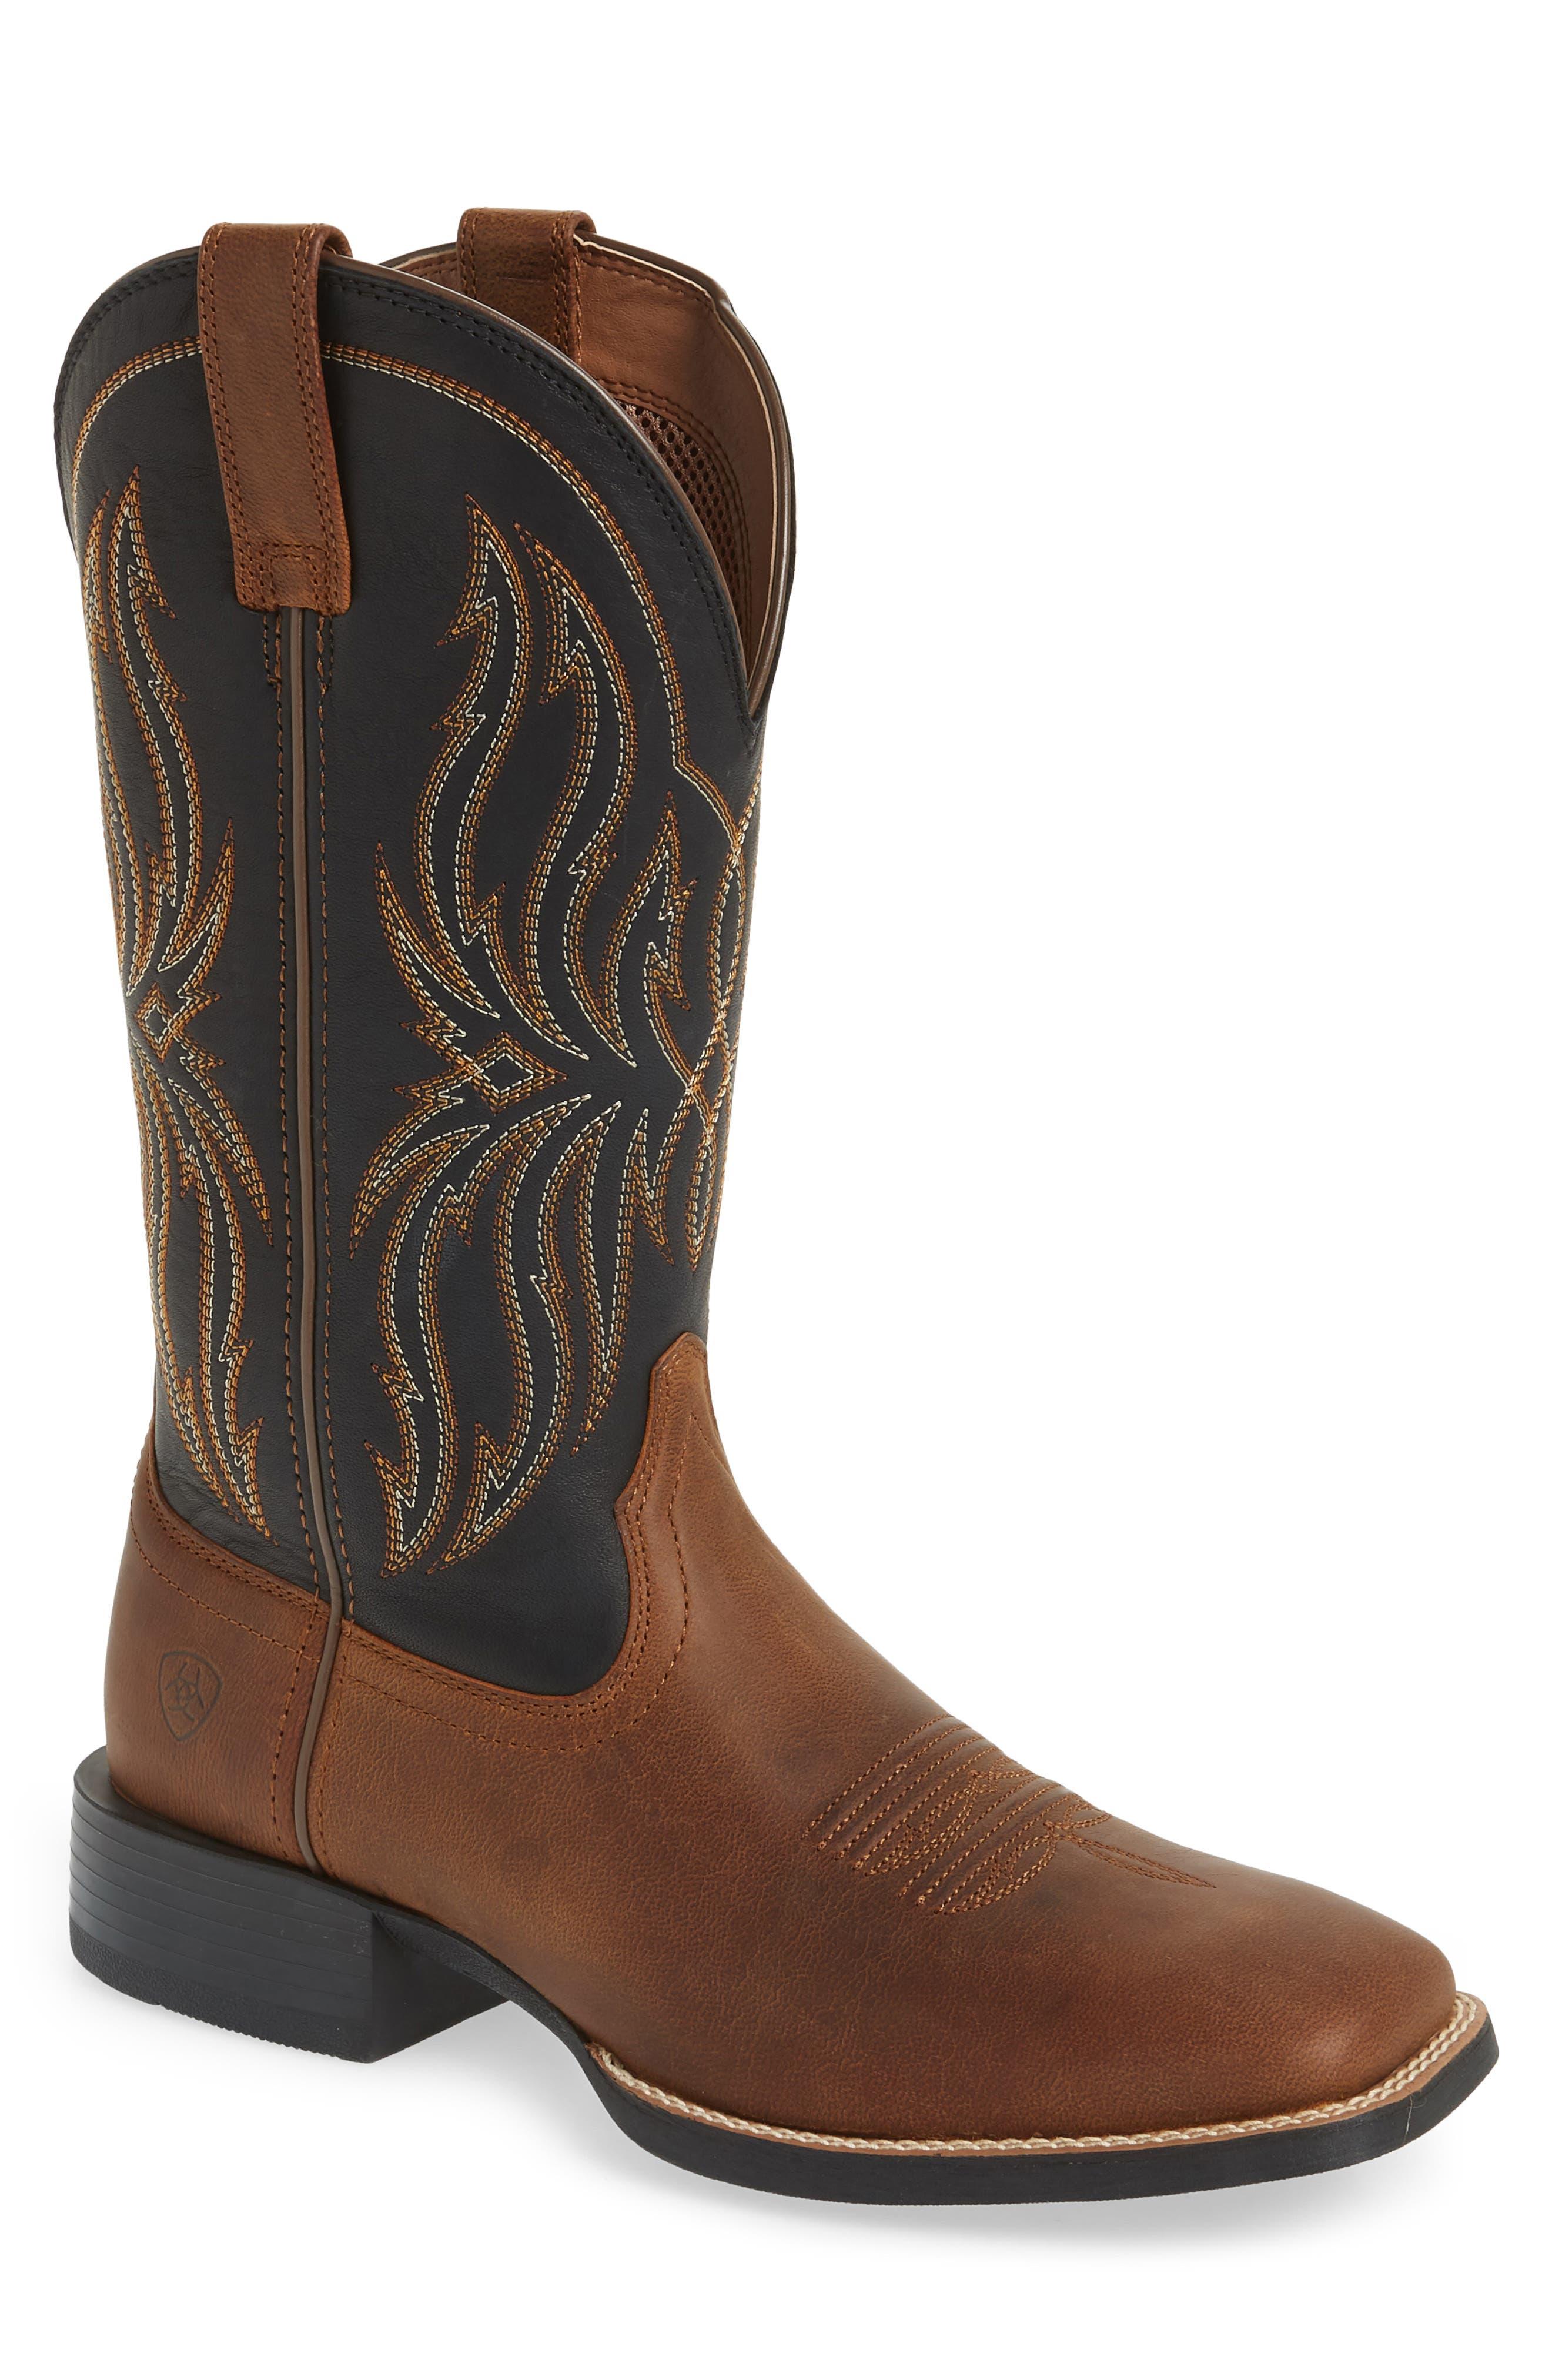 Ariat Sport Rustler Cowboy Boot, Brown